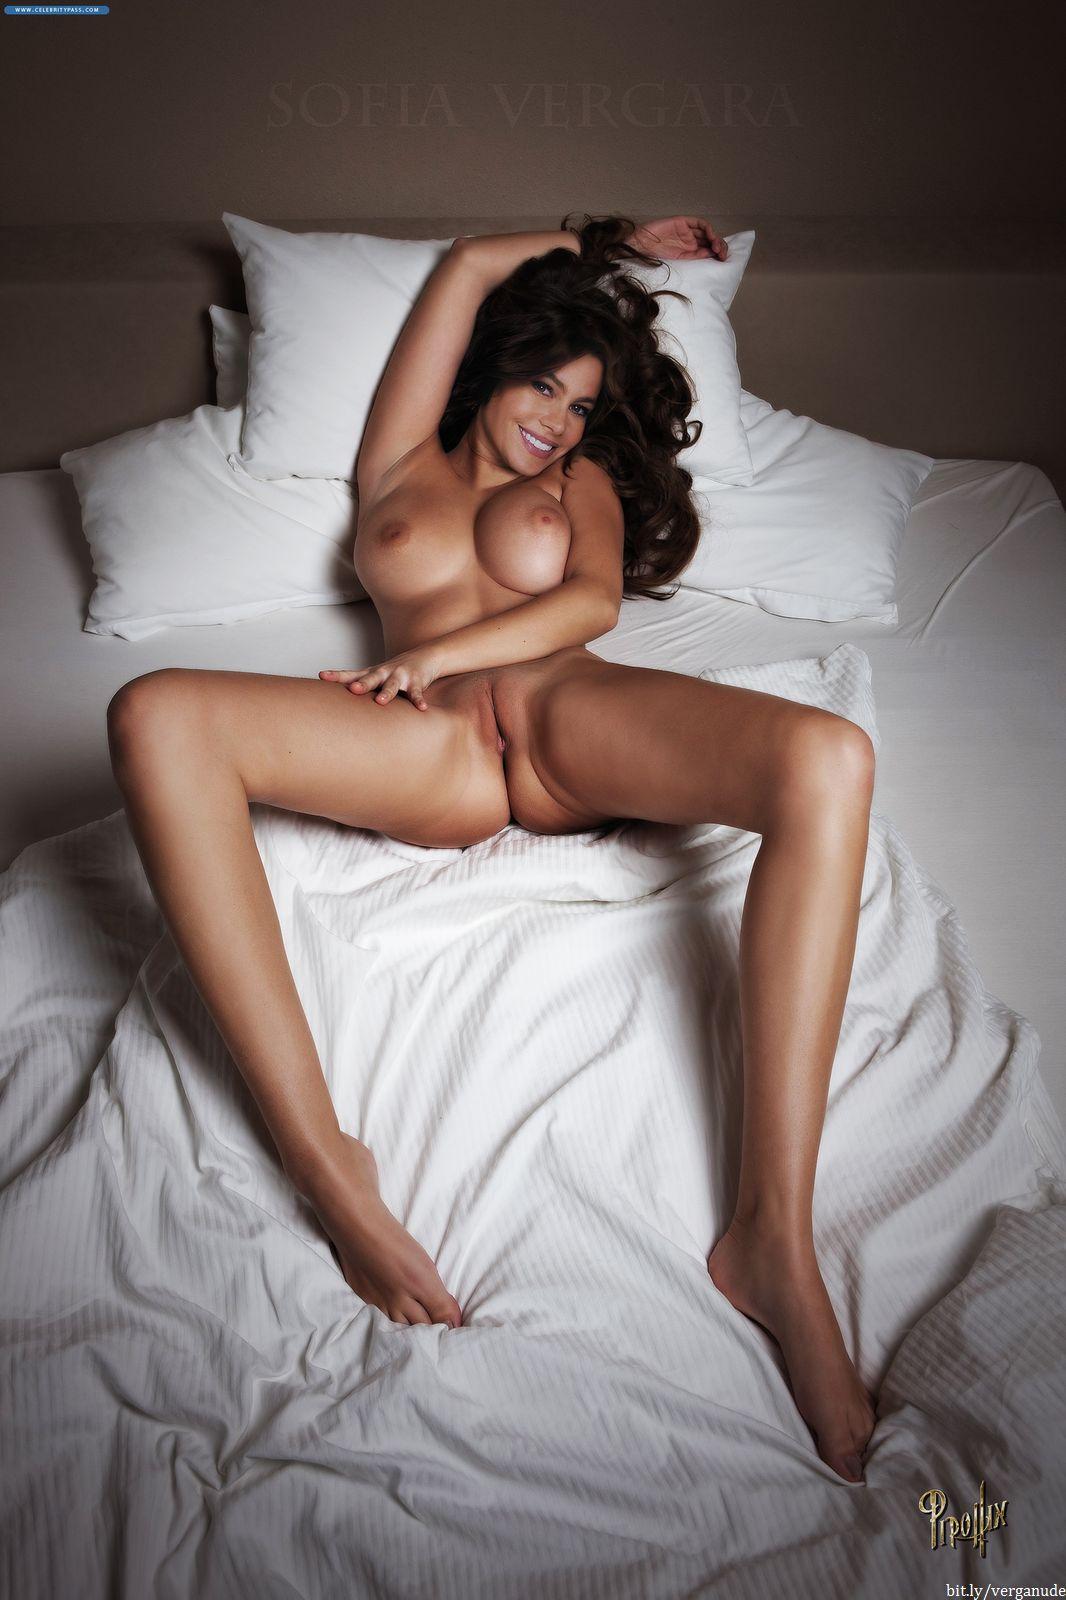 Nude sophia verga